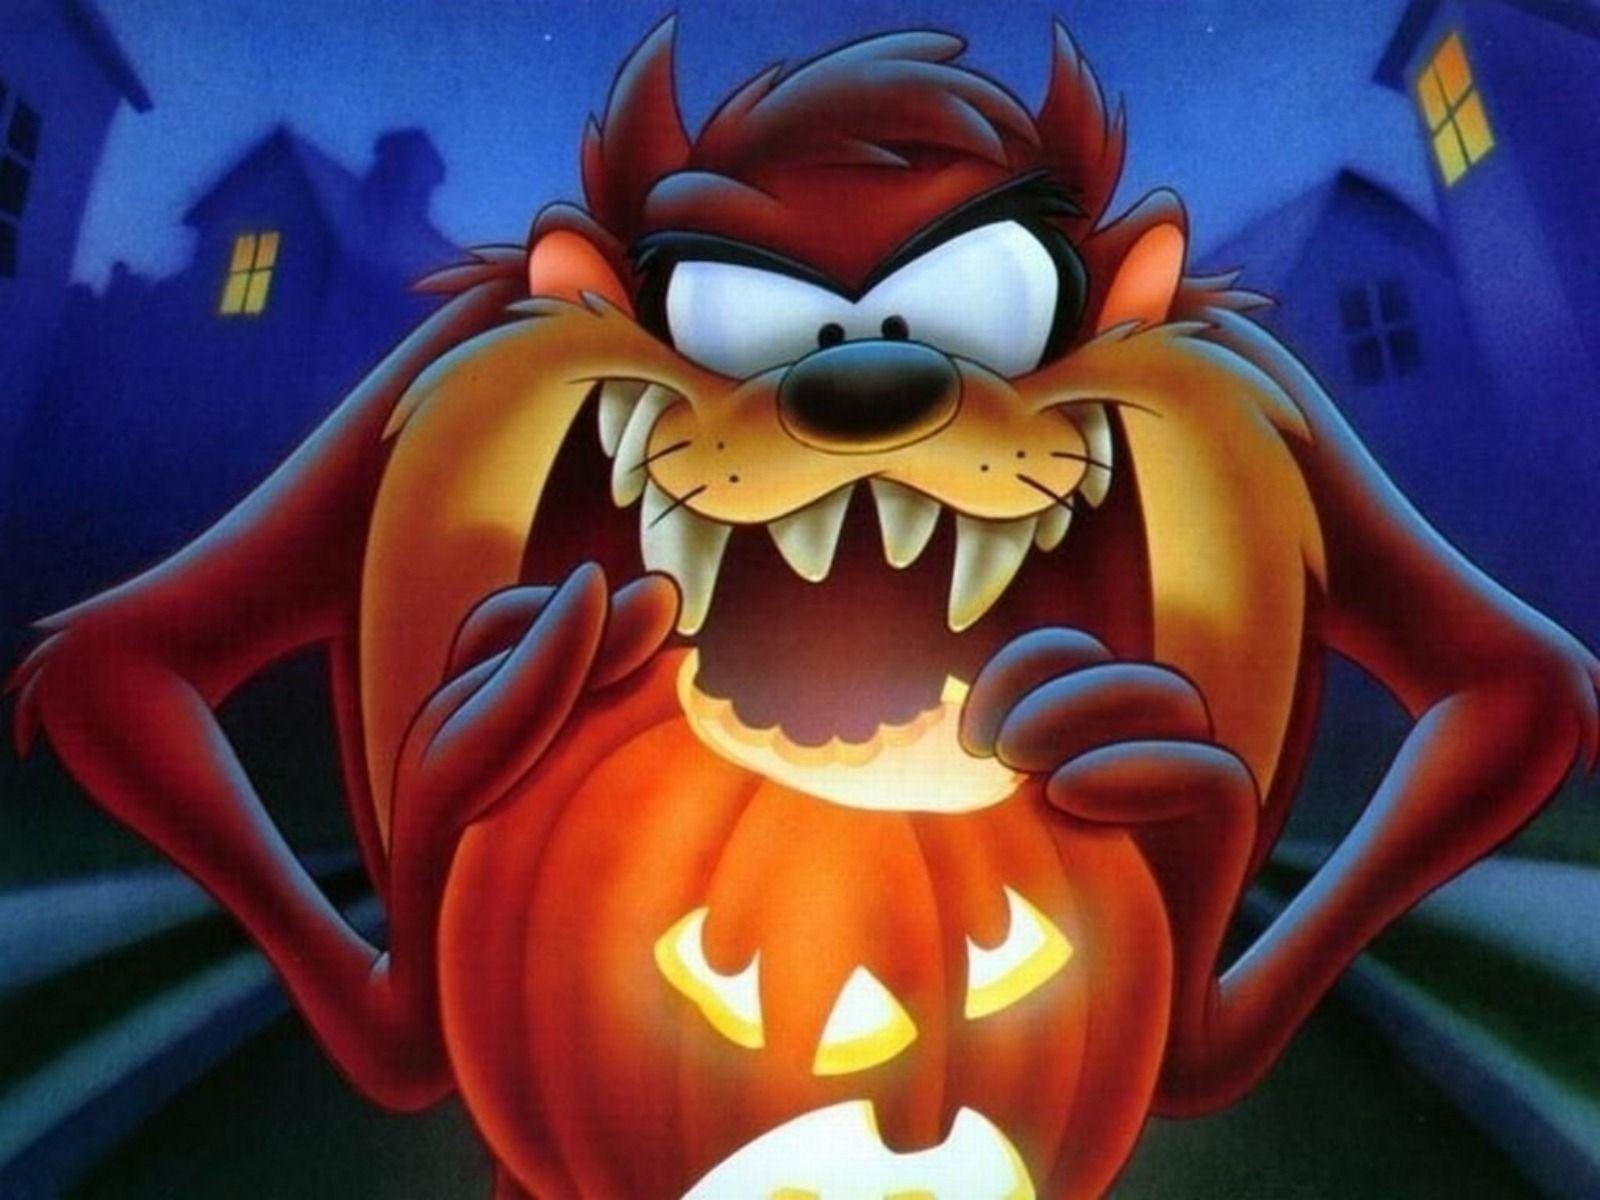 cute halloween pics cool halloween pics halloween pics pinterest halloween saying pics - Cool Halloween Pics